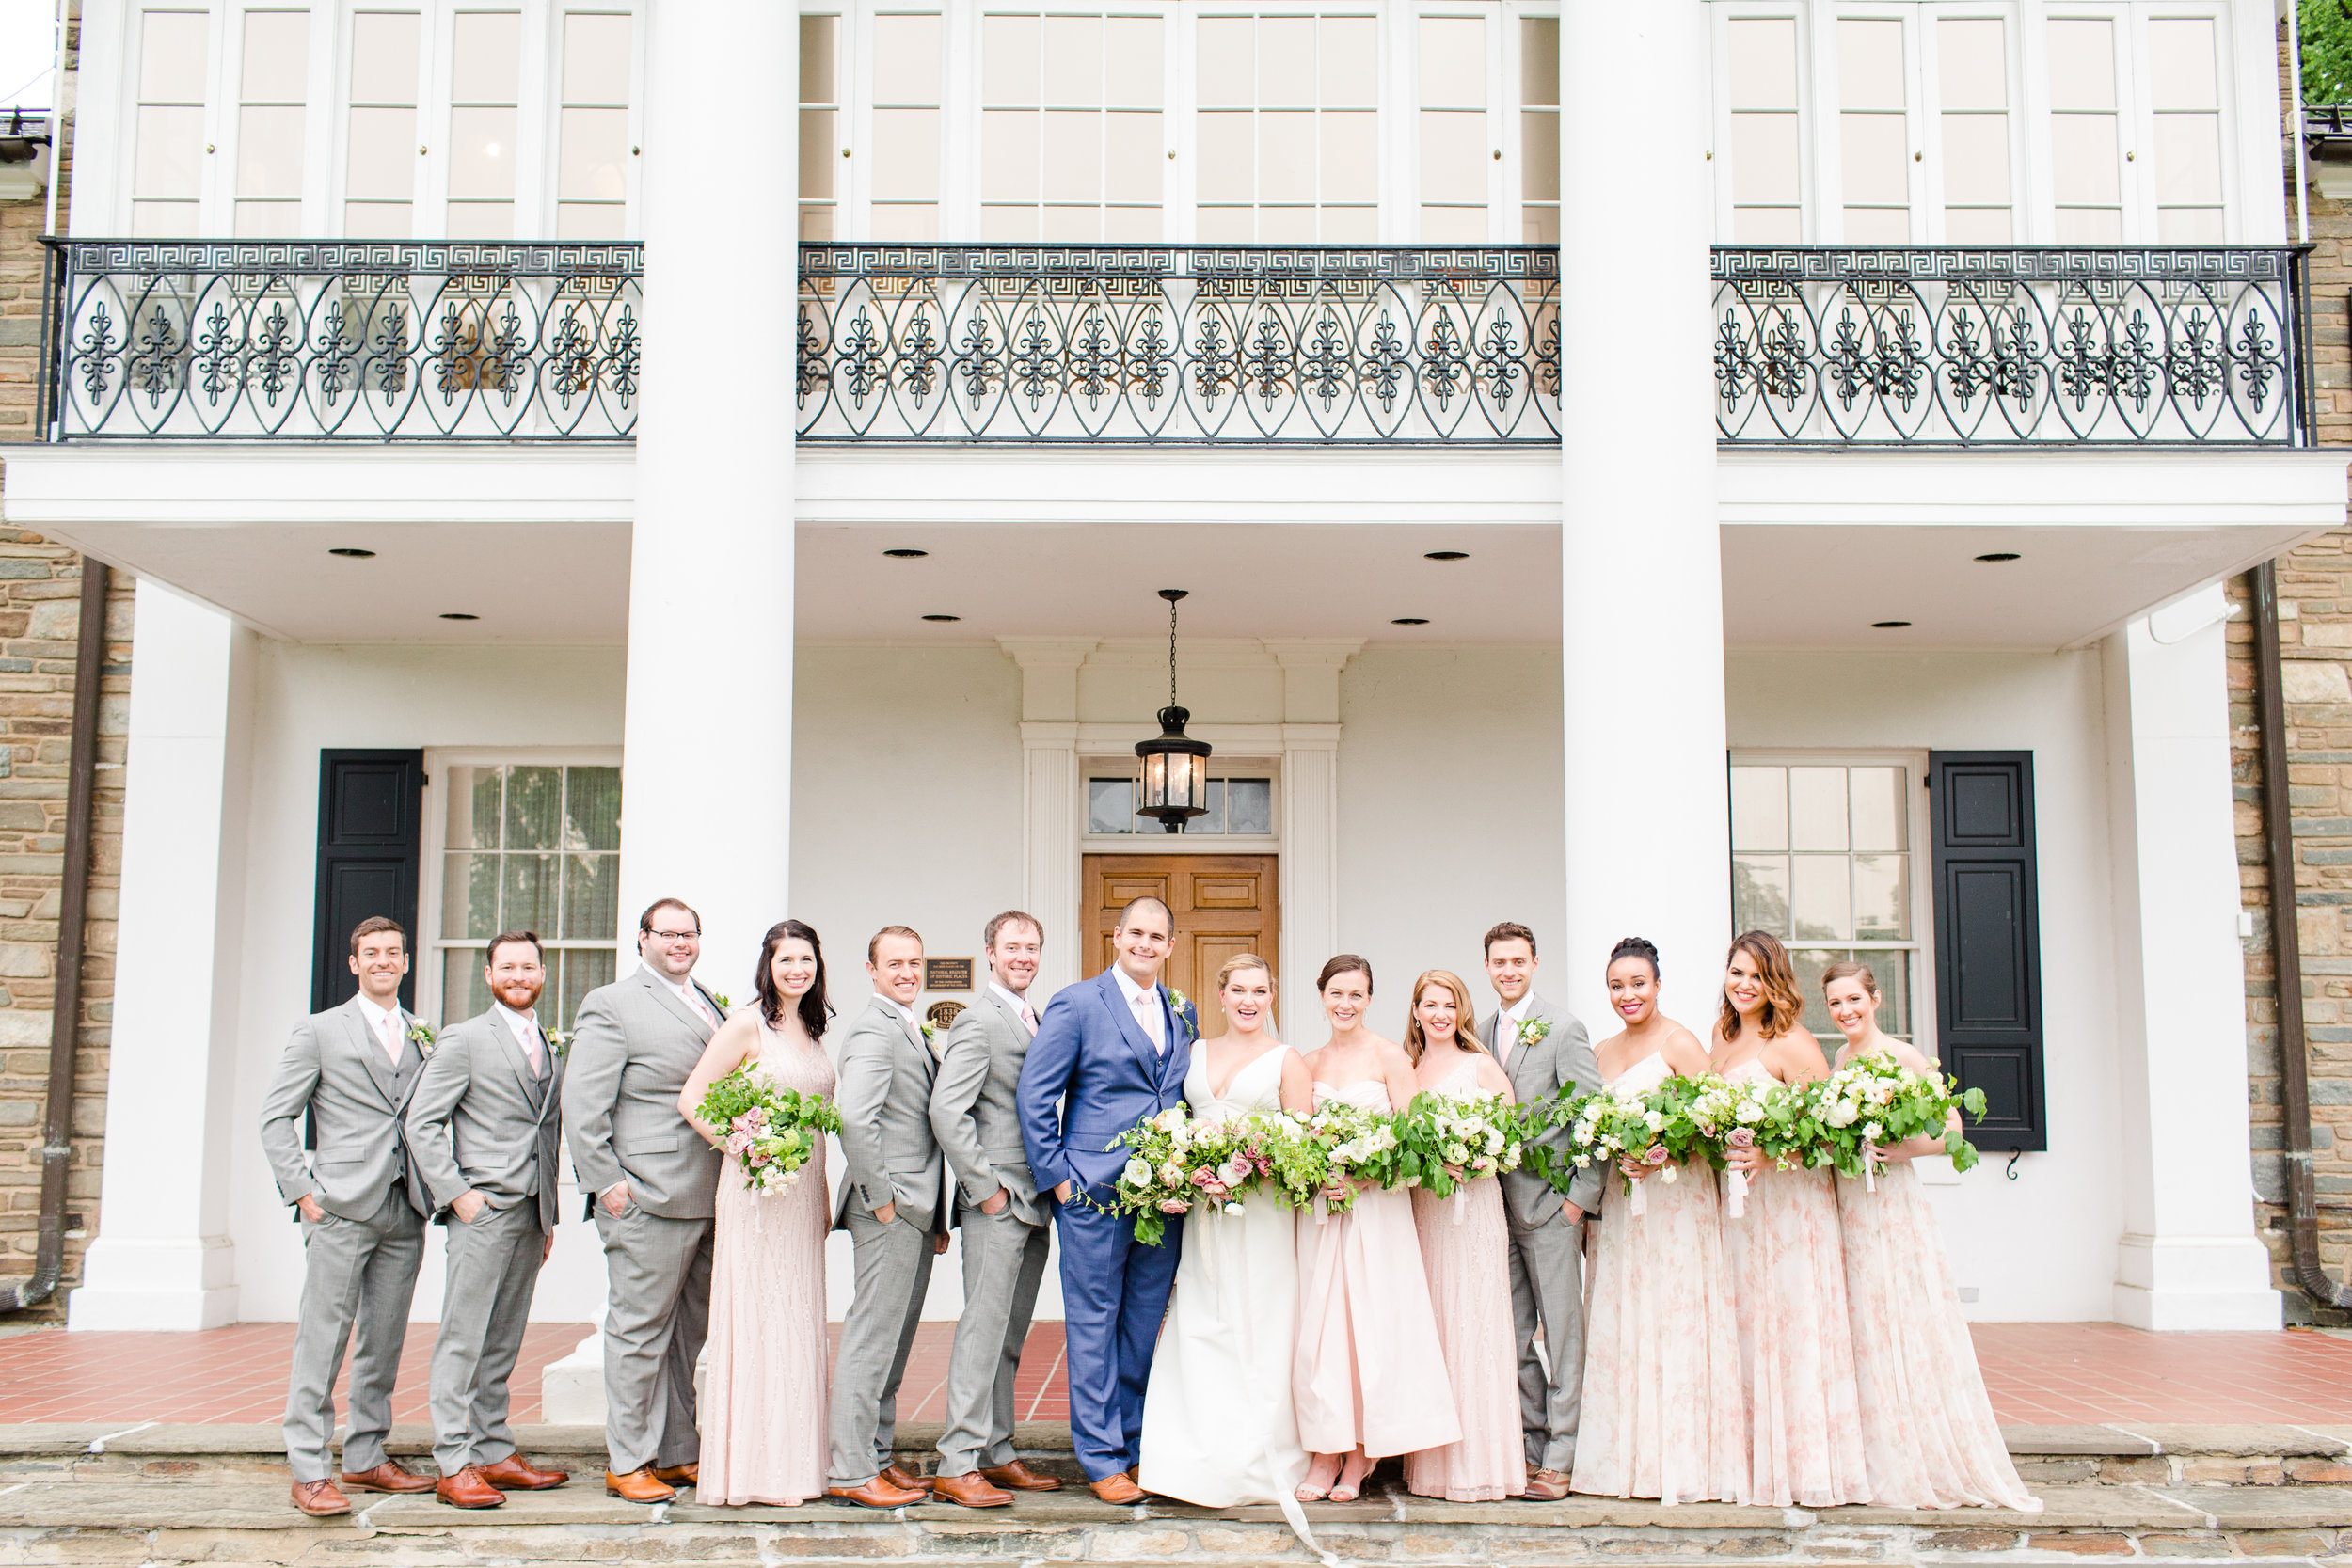 glenview-mansion-rockville-maryland-bourbon-derby-buker-wedding-party-bethanne-arthur-photography-photos-109.jpg